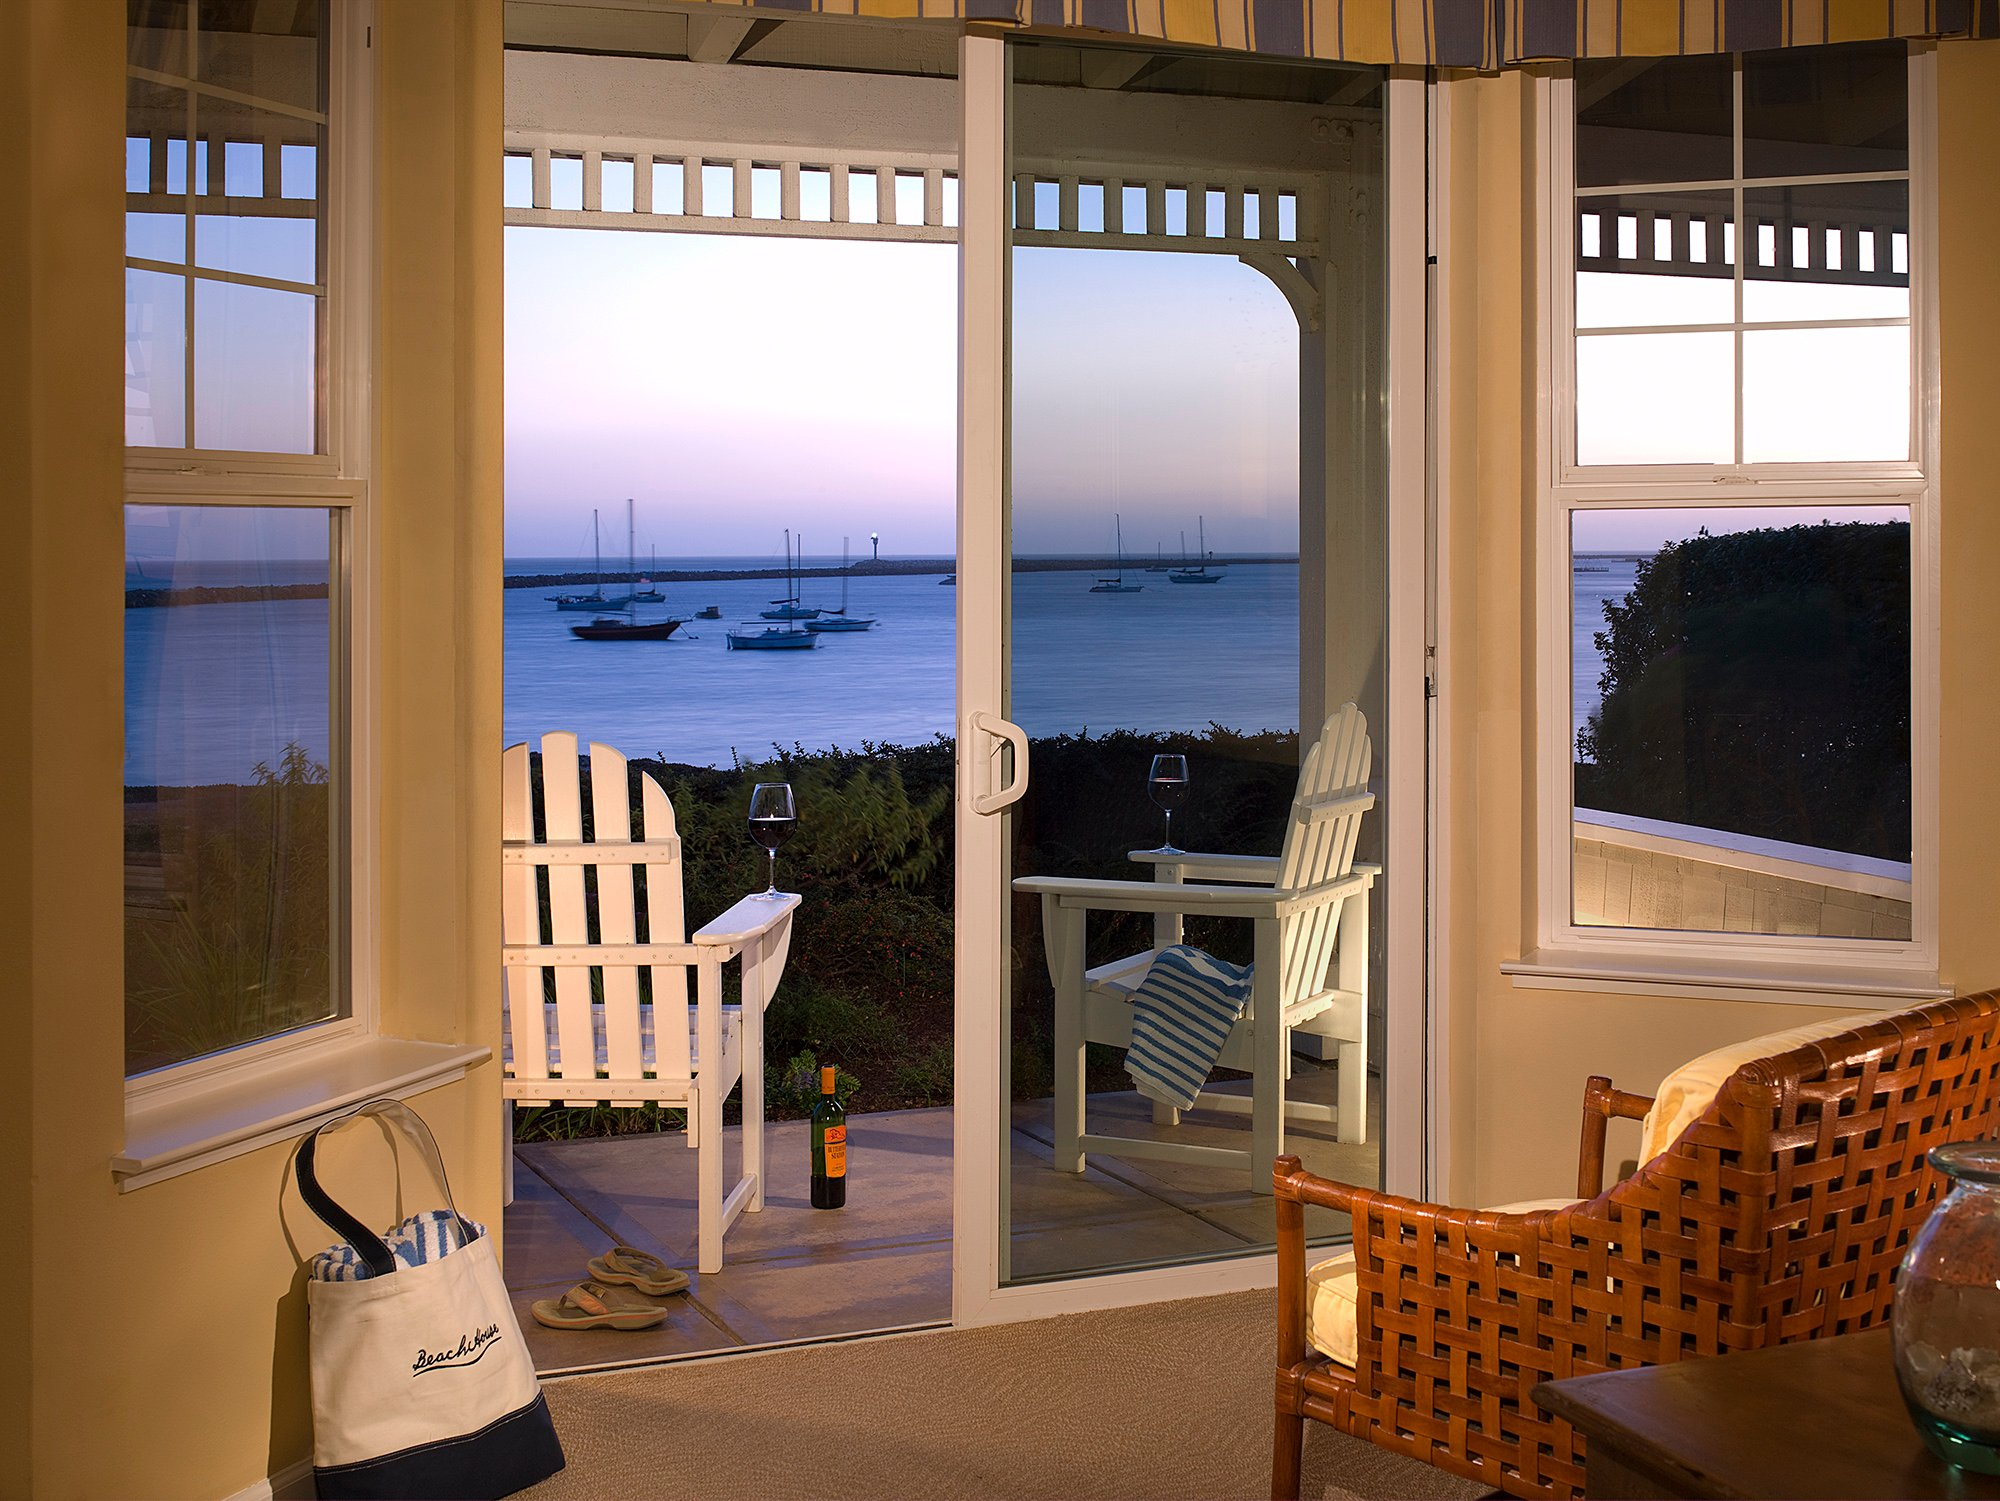 Luxury Hotel Half Moon Bay Beach House Accommodations